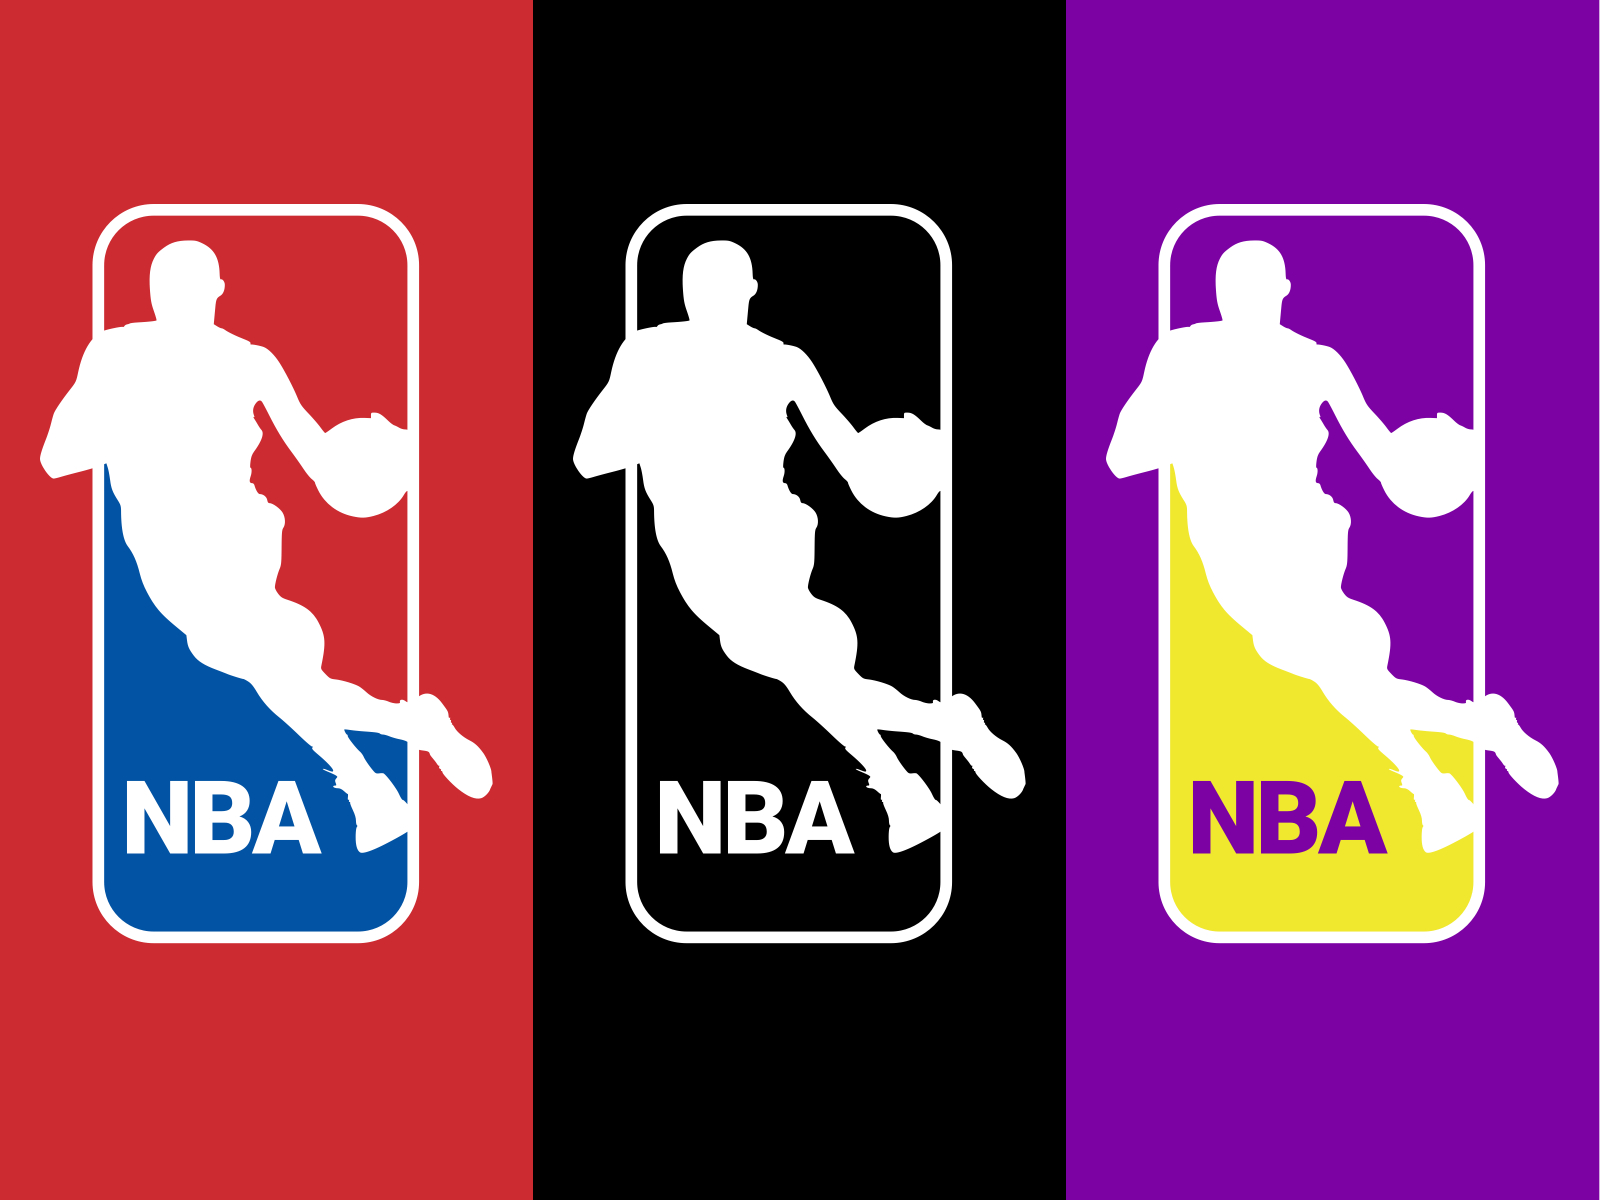 Kobe Nba Logo Redesign By James Drake On Dribbble